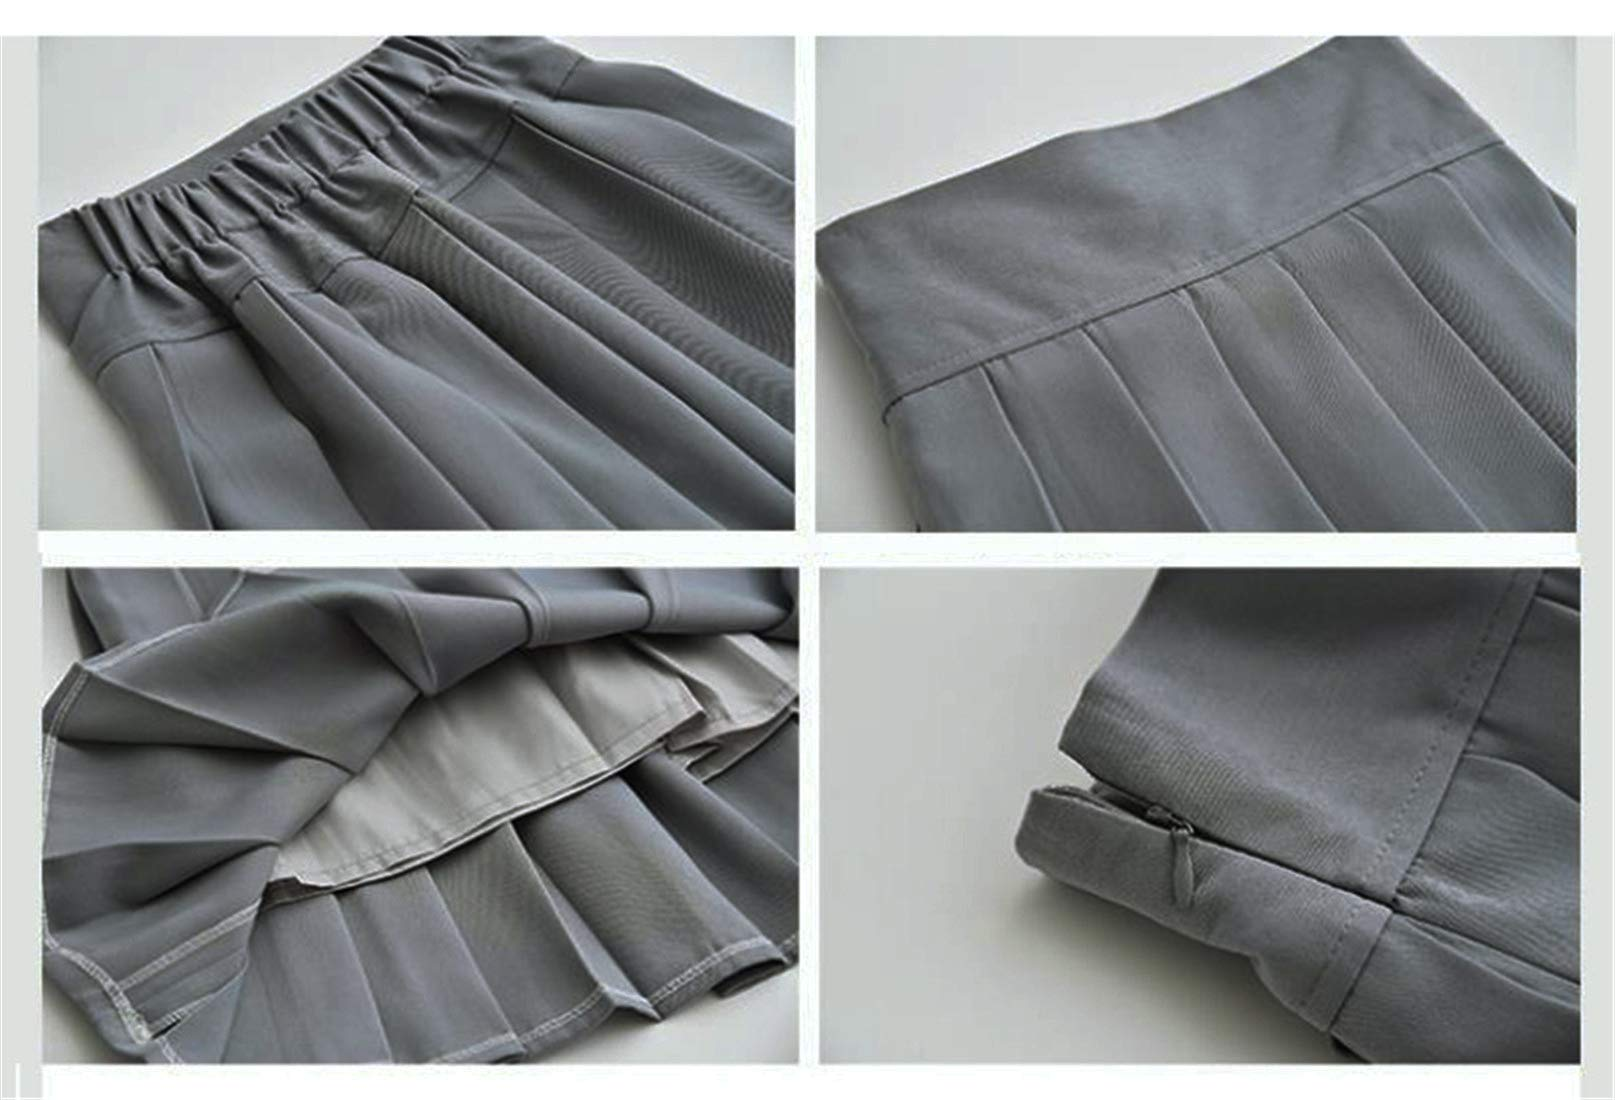 Beautifulfashionlife Women's High Waisted Pleated Mini Skirt A-line Shorts with Elastic Wide Waistband (Small, Dark Grey) by Beautifulfashionlife